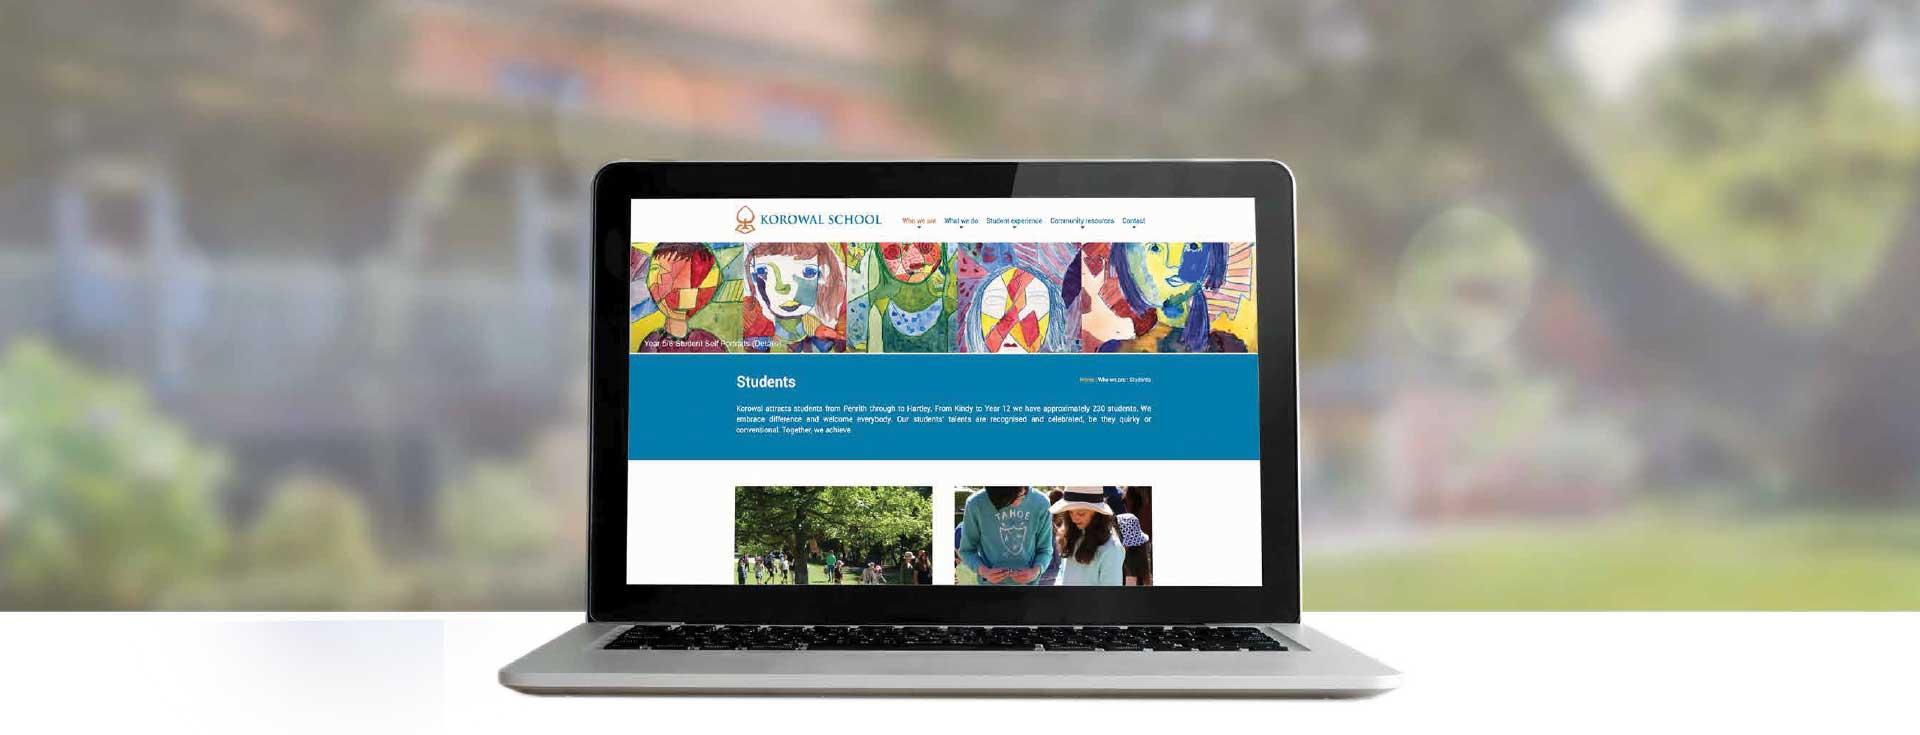 Korowal School website design